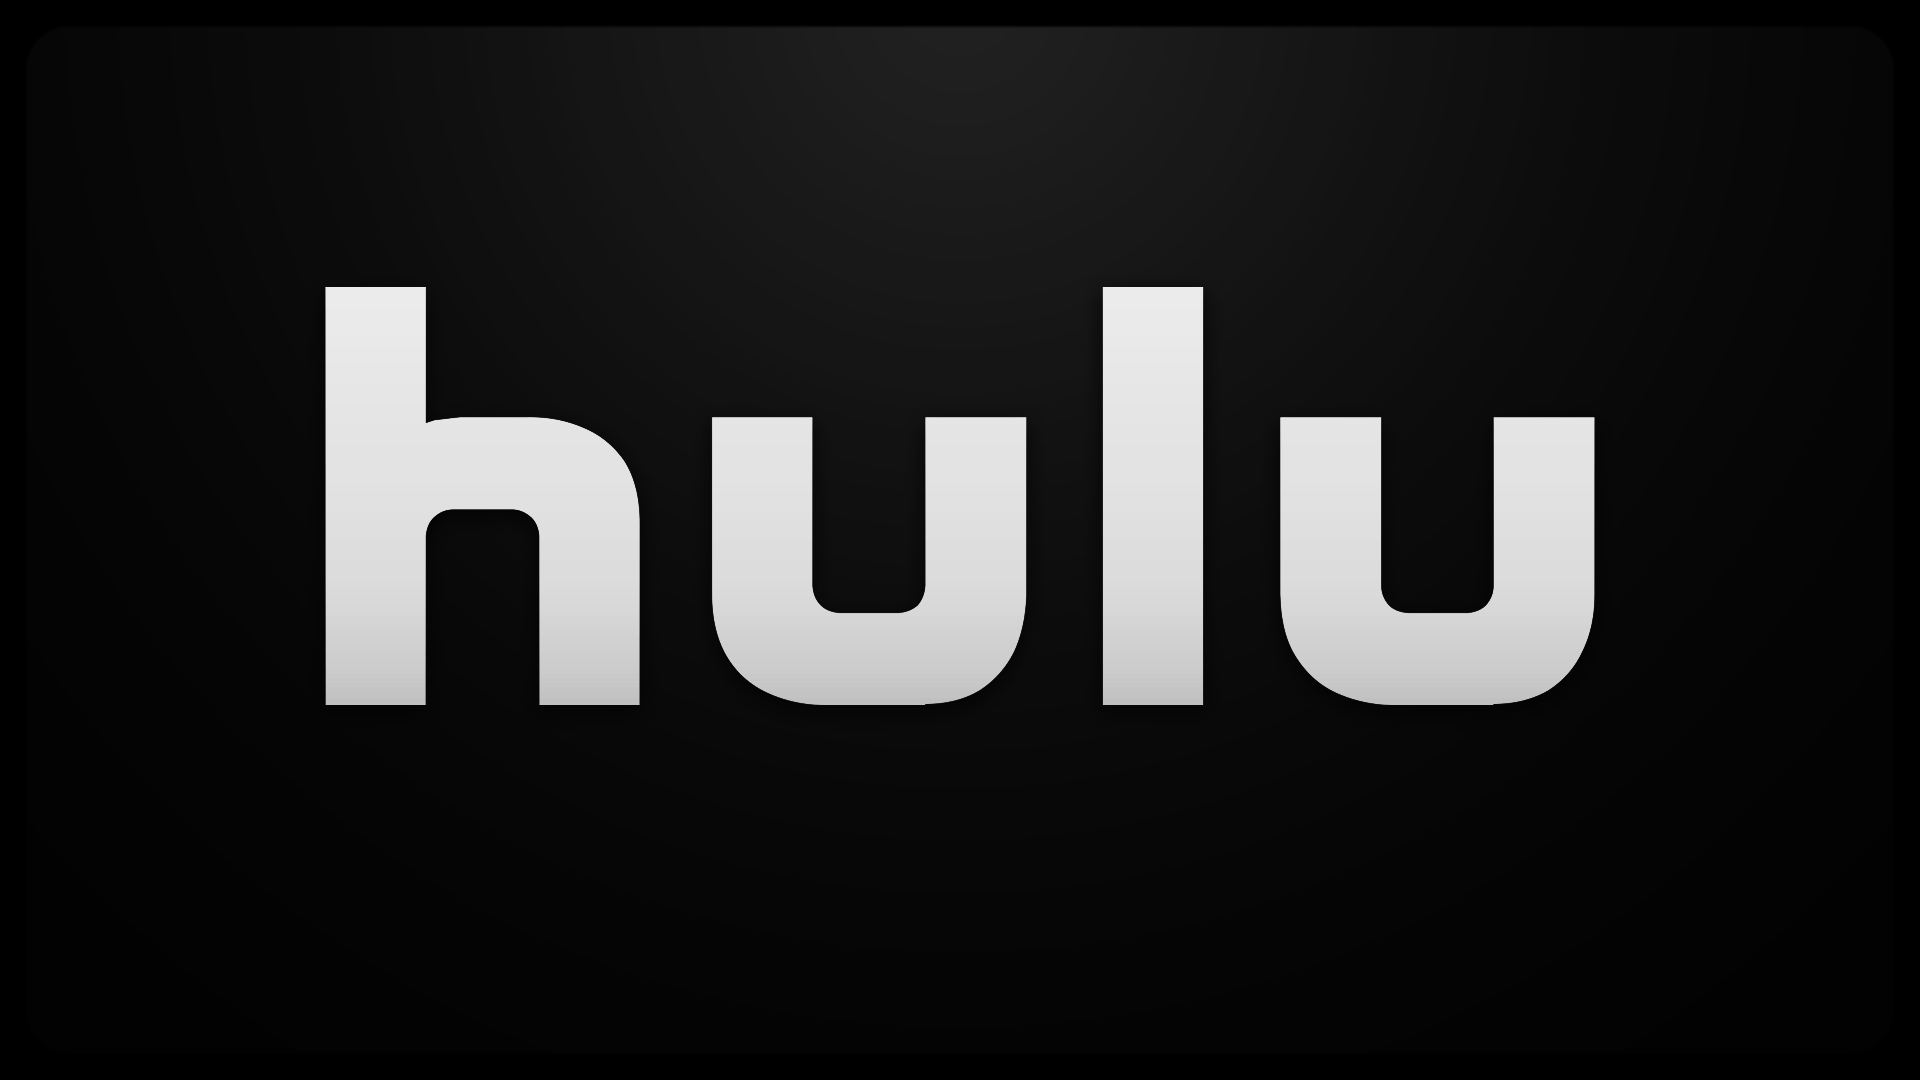 Hulu logo_1.png